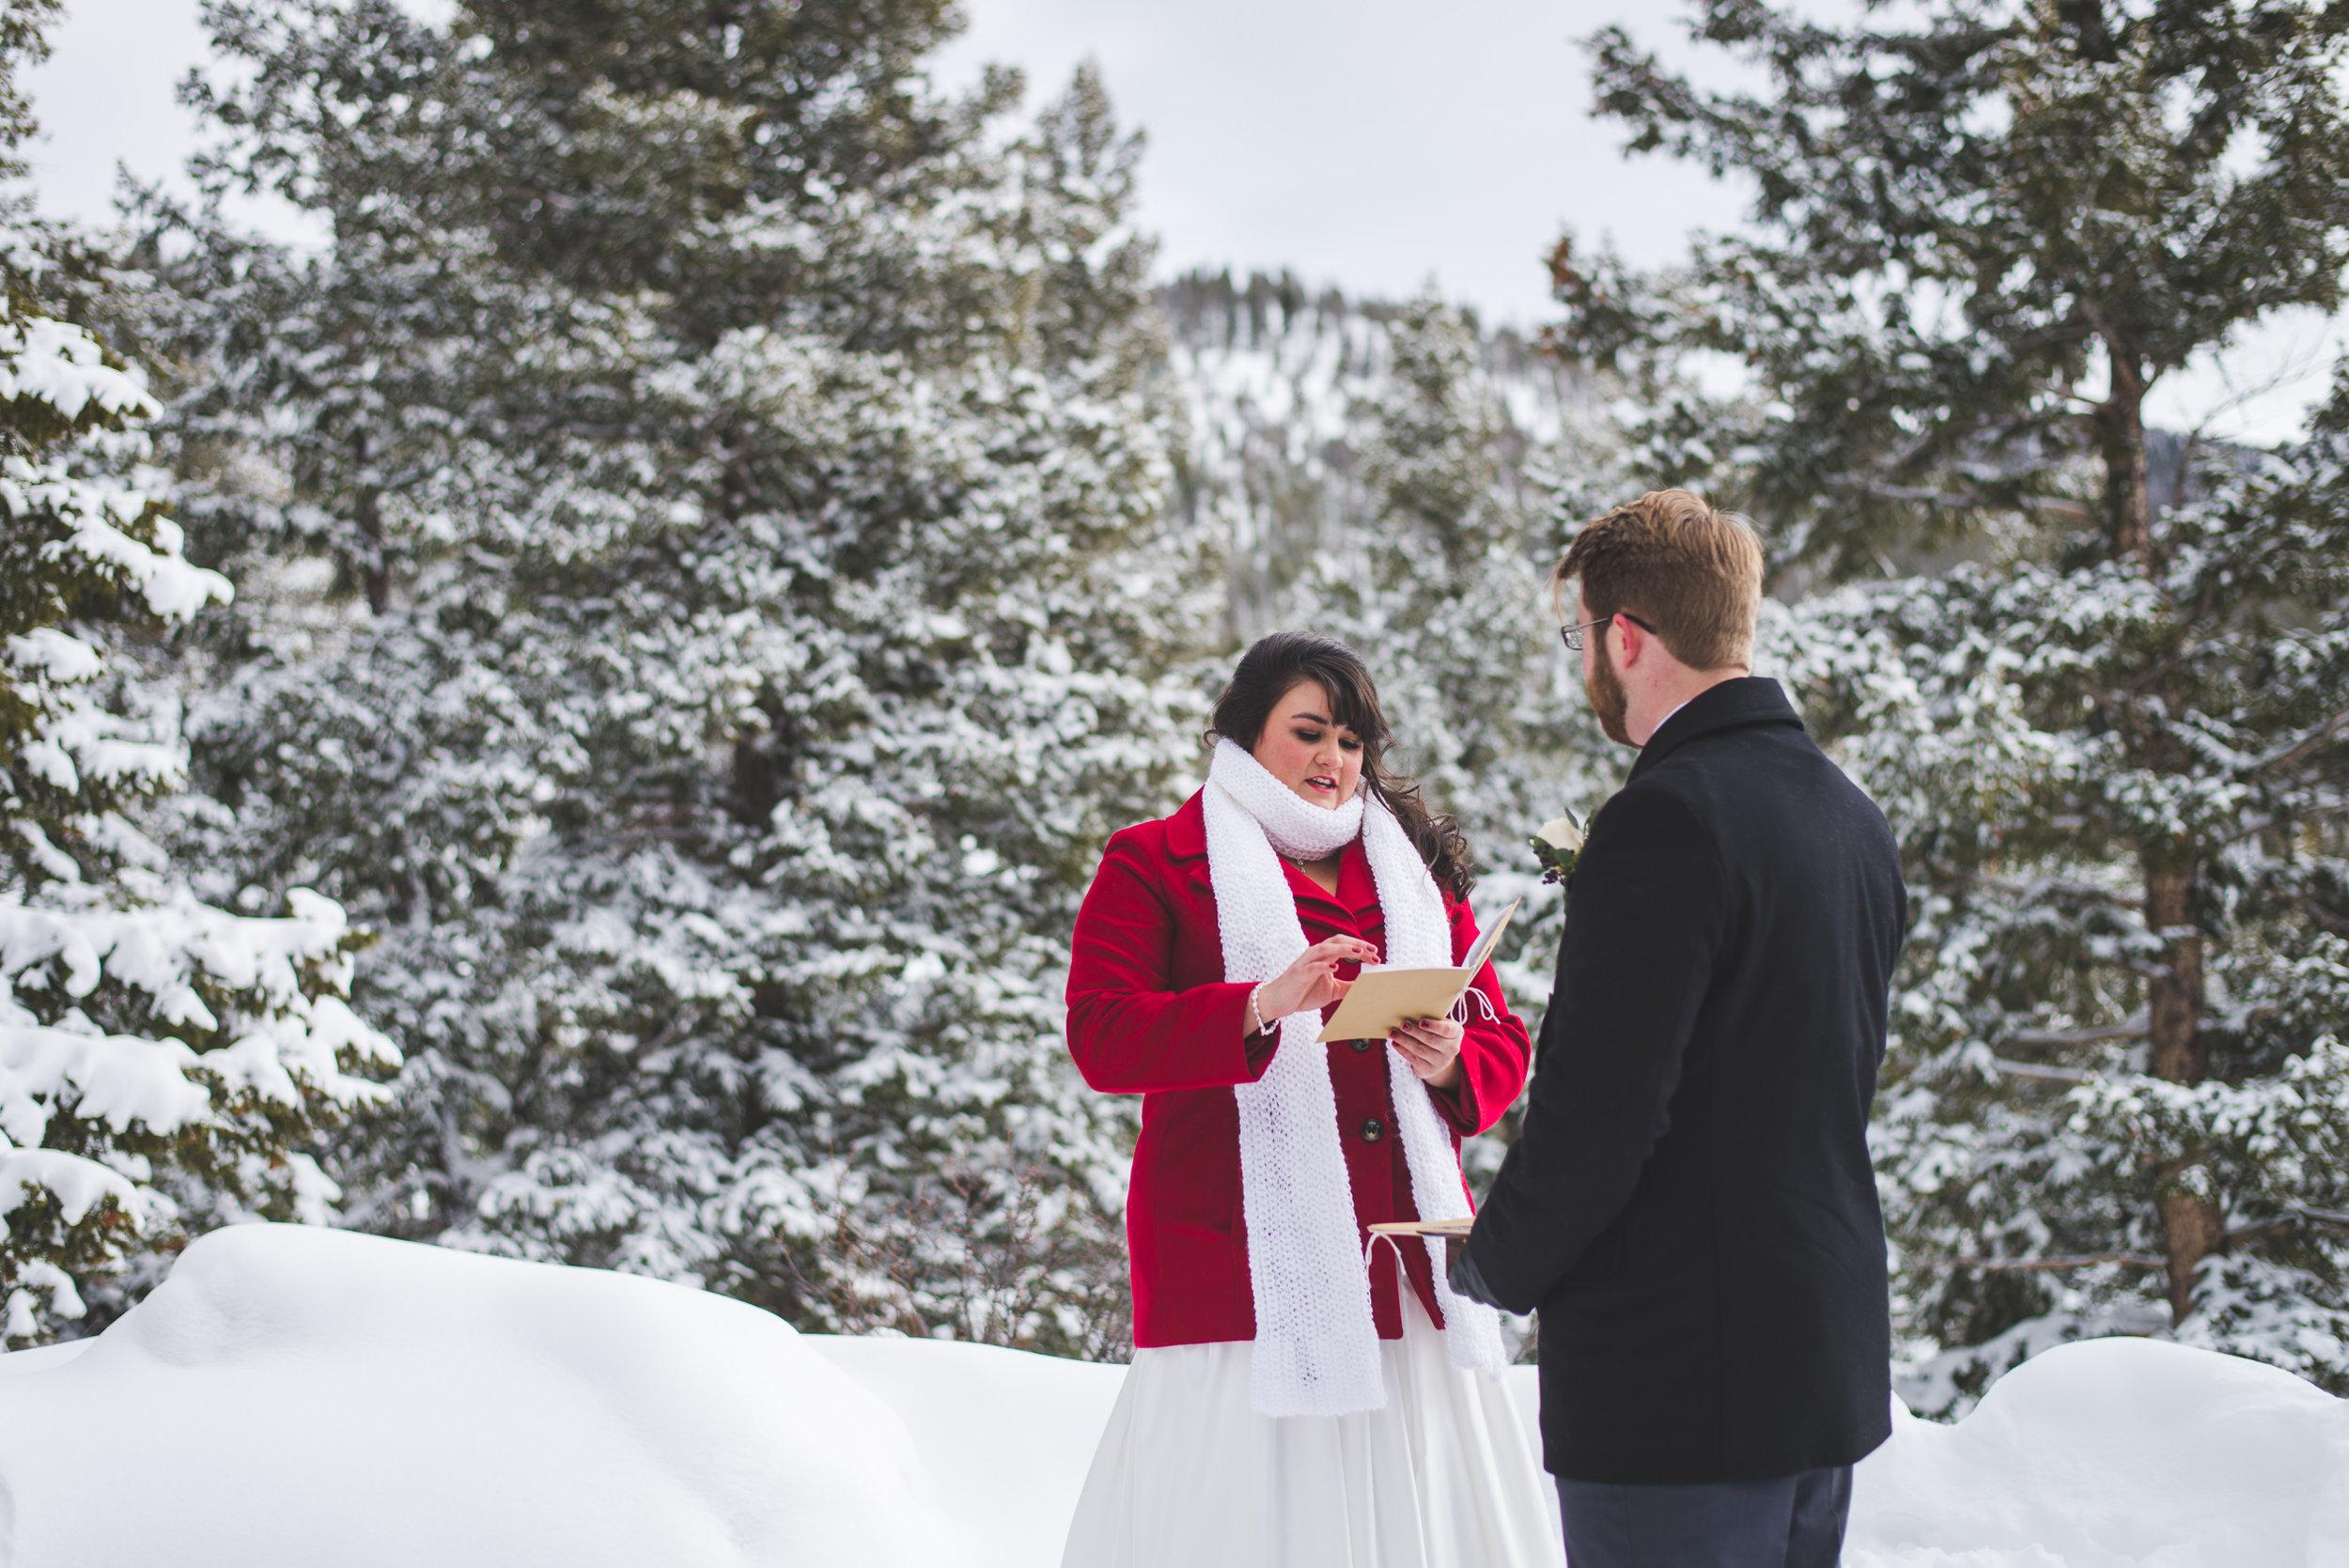 Beautiful winter elopement at Sapphire Point near Breckenridge, Colorado.